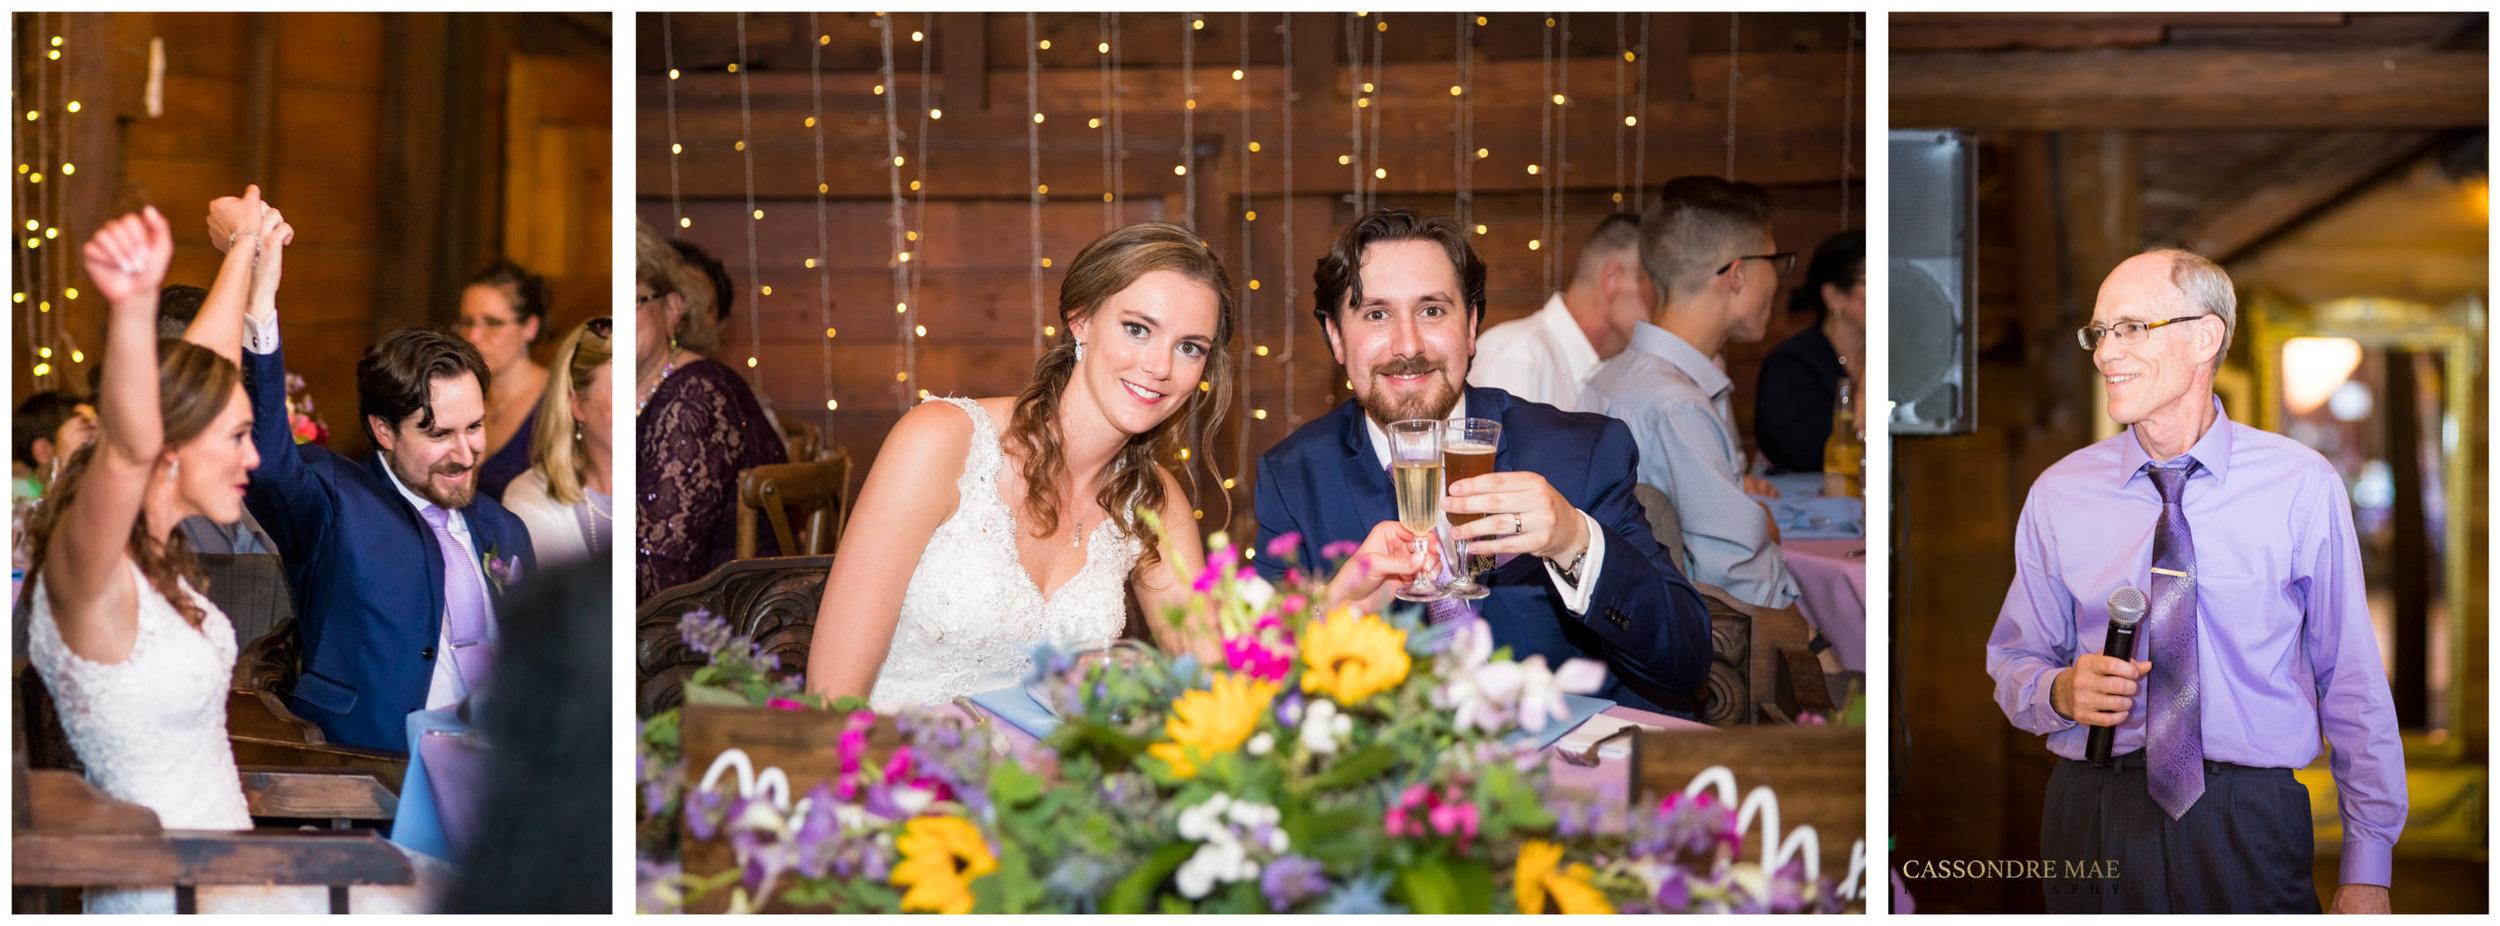 Cassondre Mae Photography hudson valley barn weddings -17.jpg